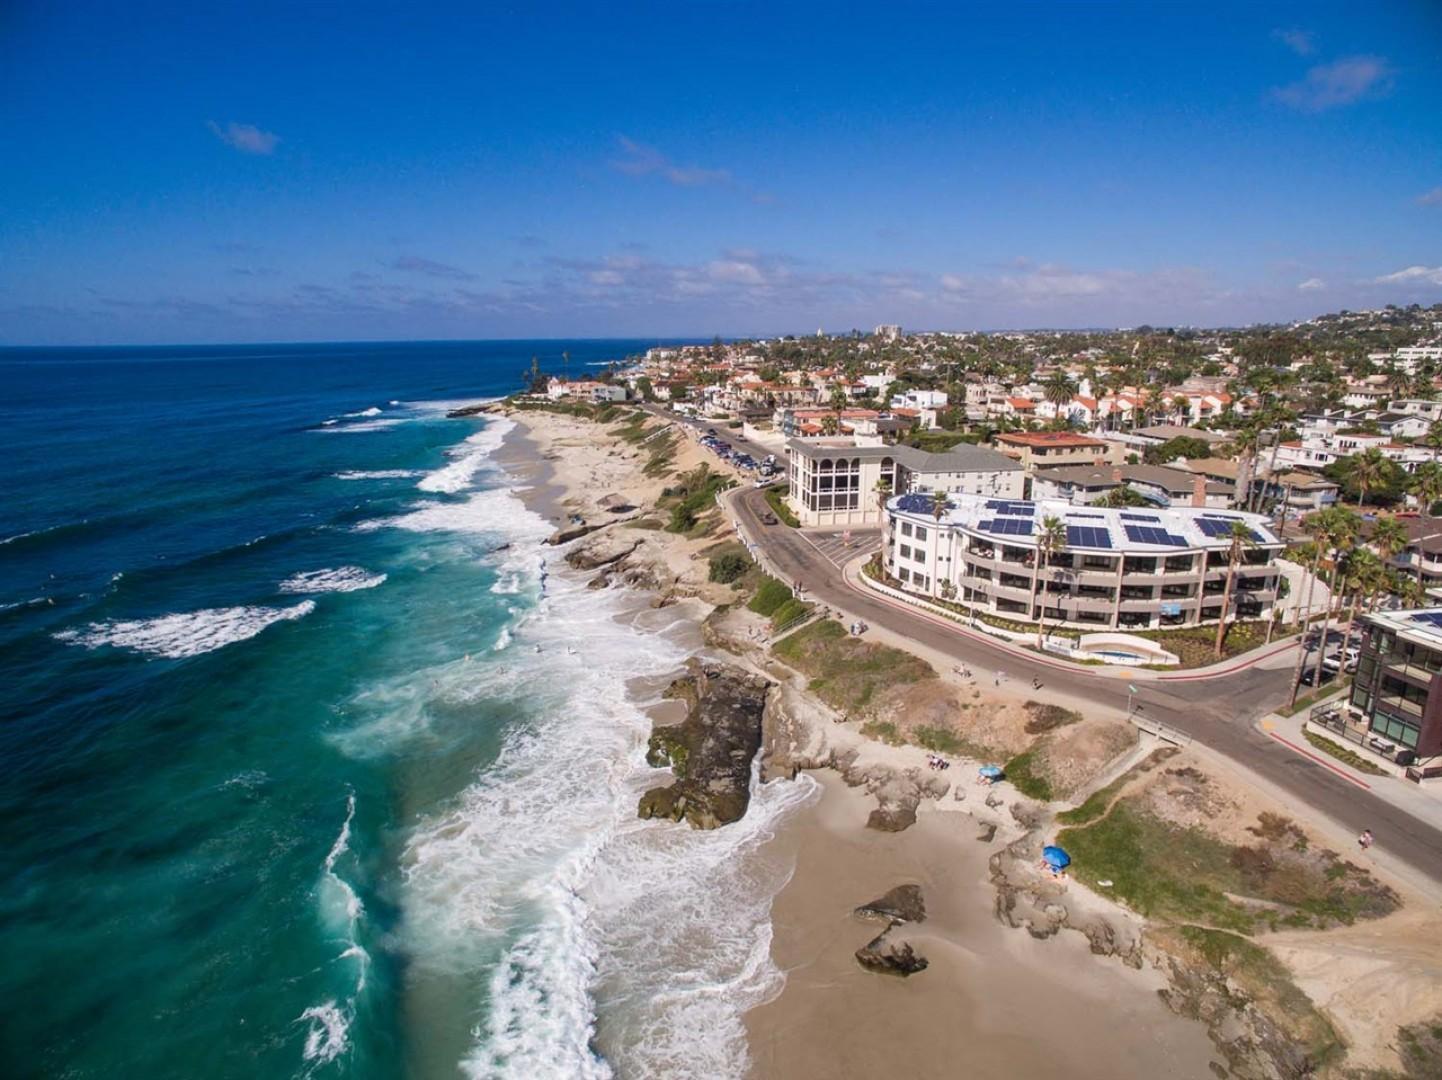 The beautiful coastline of La Jolla in San Diego, California